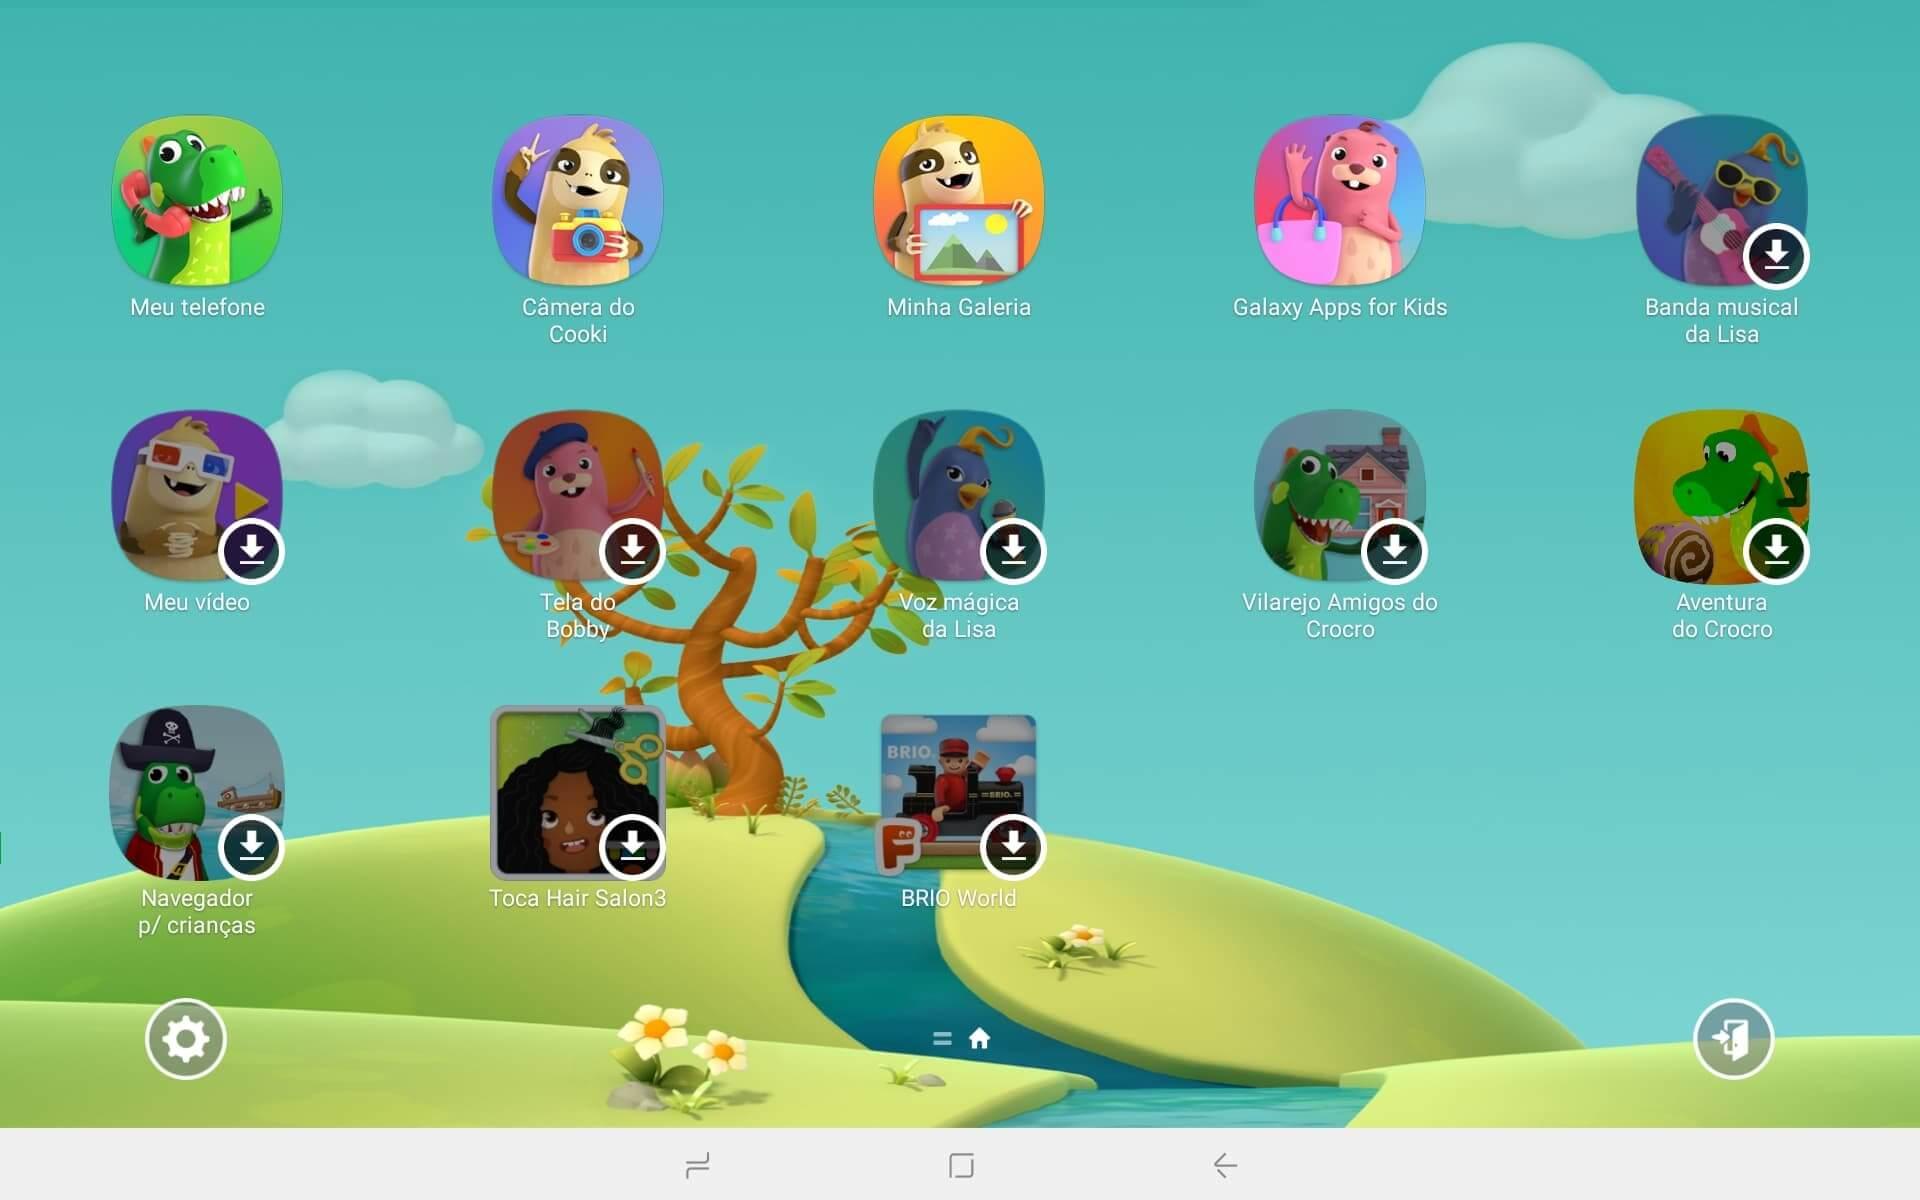 48417664 2120367444695244 5550310250059399168 n - Review: Samsung Galaxy Tab A, o tablet perfeito para uso no dia-a-dia